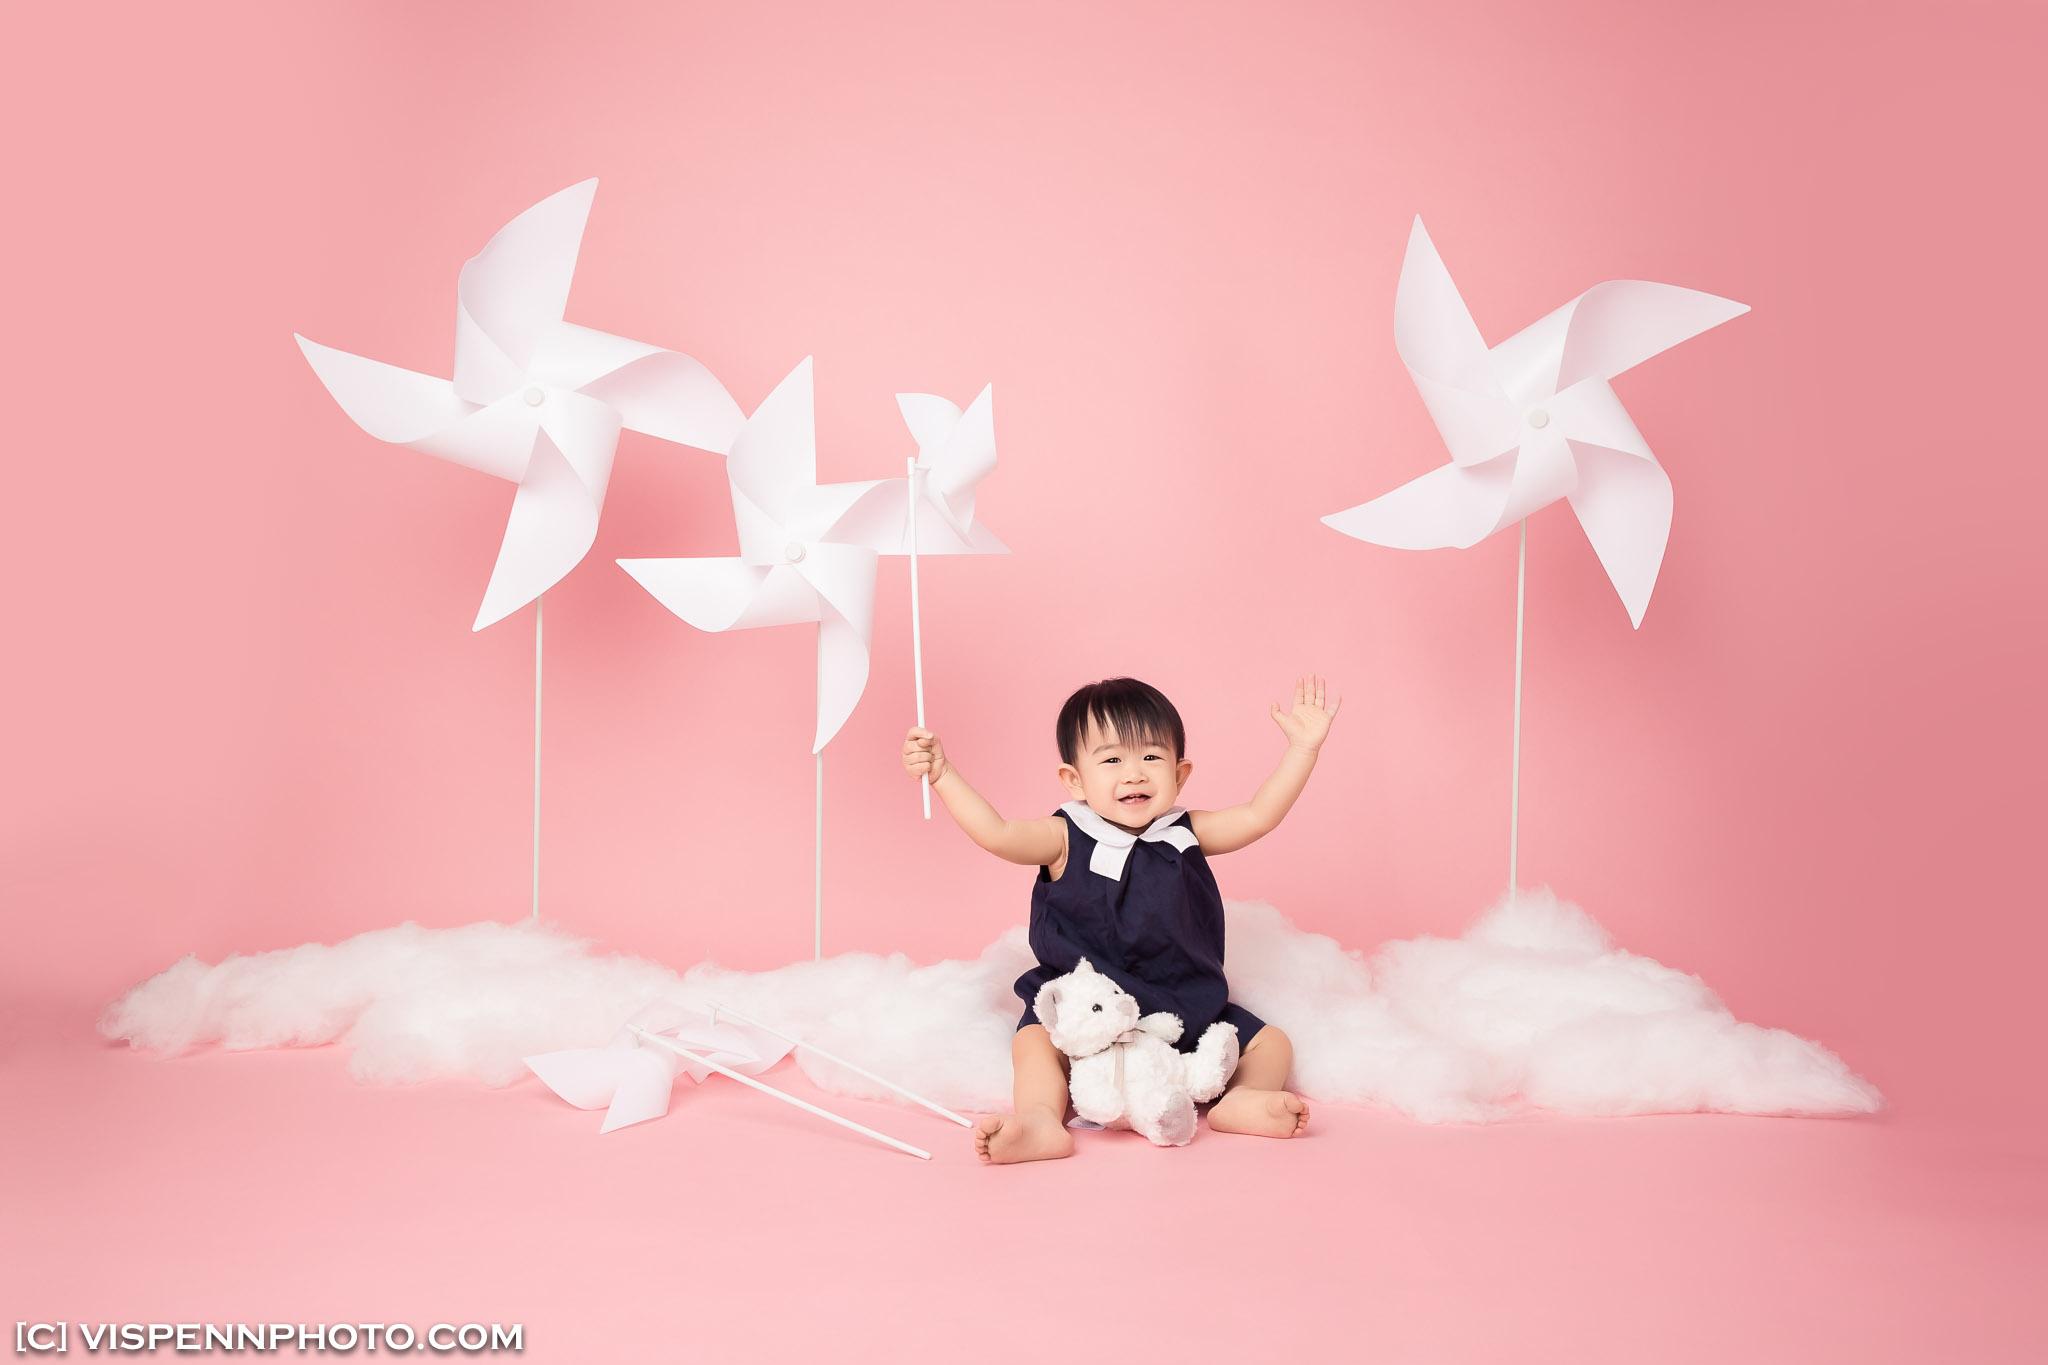 Melbourne Newborn Baby Family Photo BaoBao VISPENN 墨尔本 儿童 宝宝 百天照 满月照 孕妇照 全家福 KIDS TerenceCHEN 2661 VISPENN